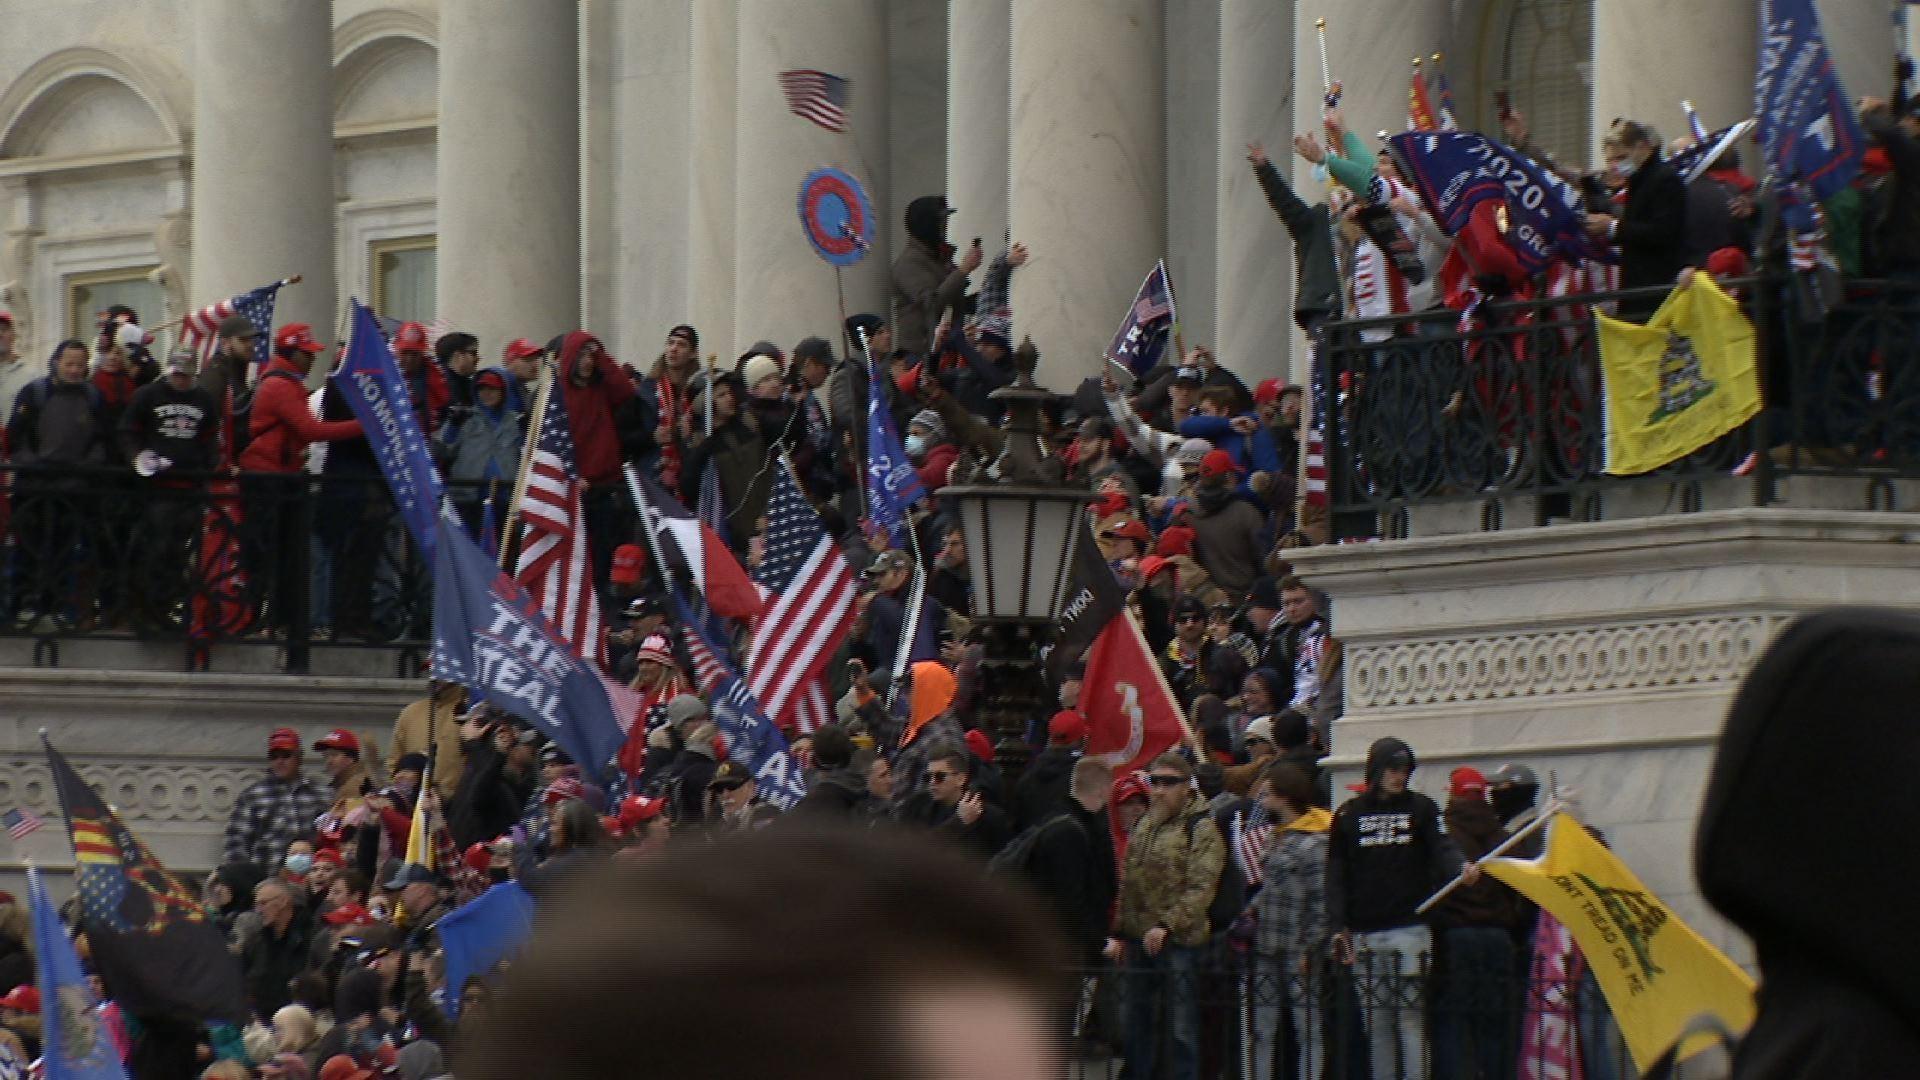 Naples man among those arrested in Washington D.C. after violent Capitol siege 1